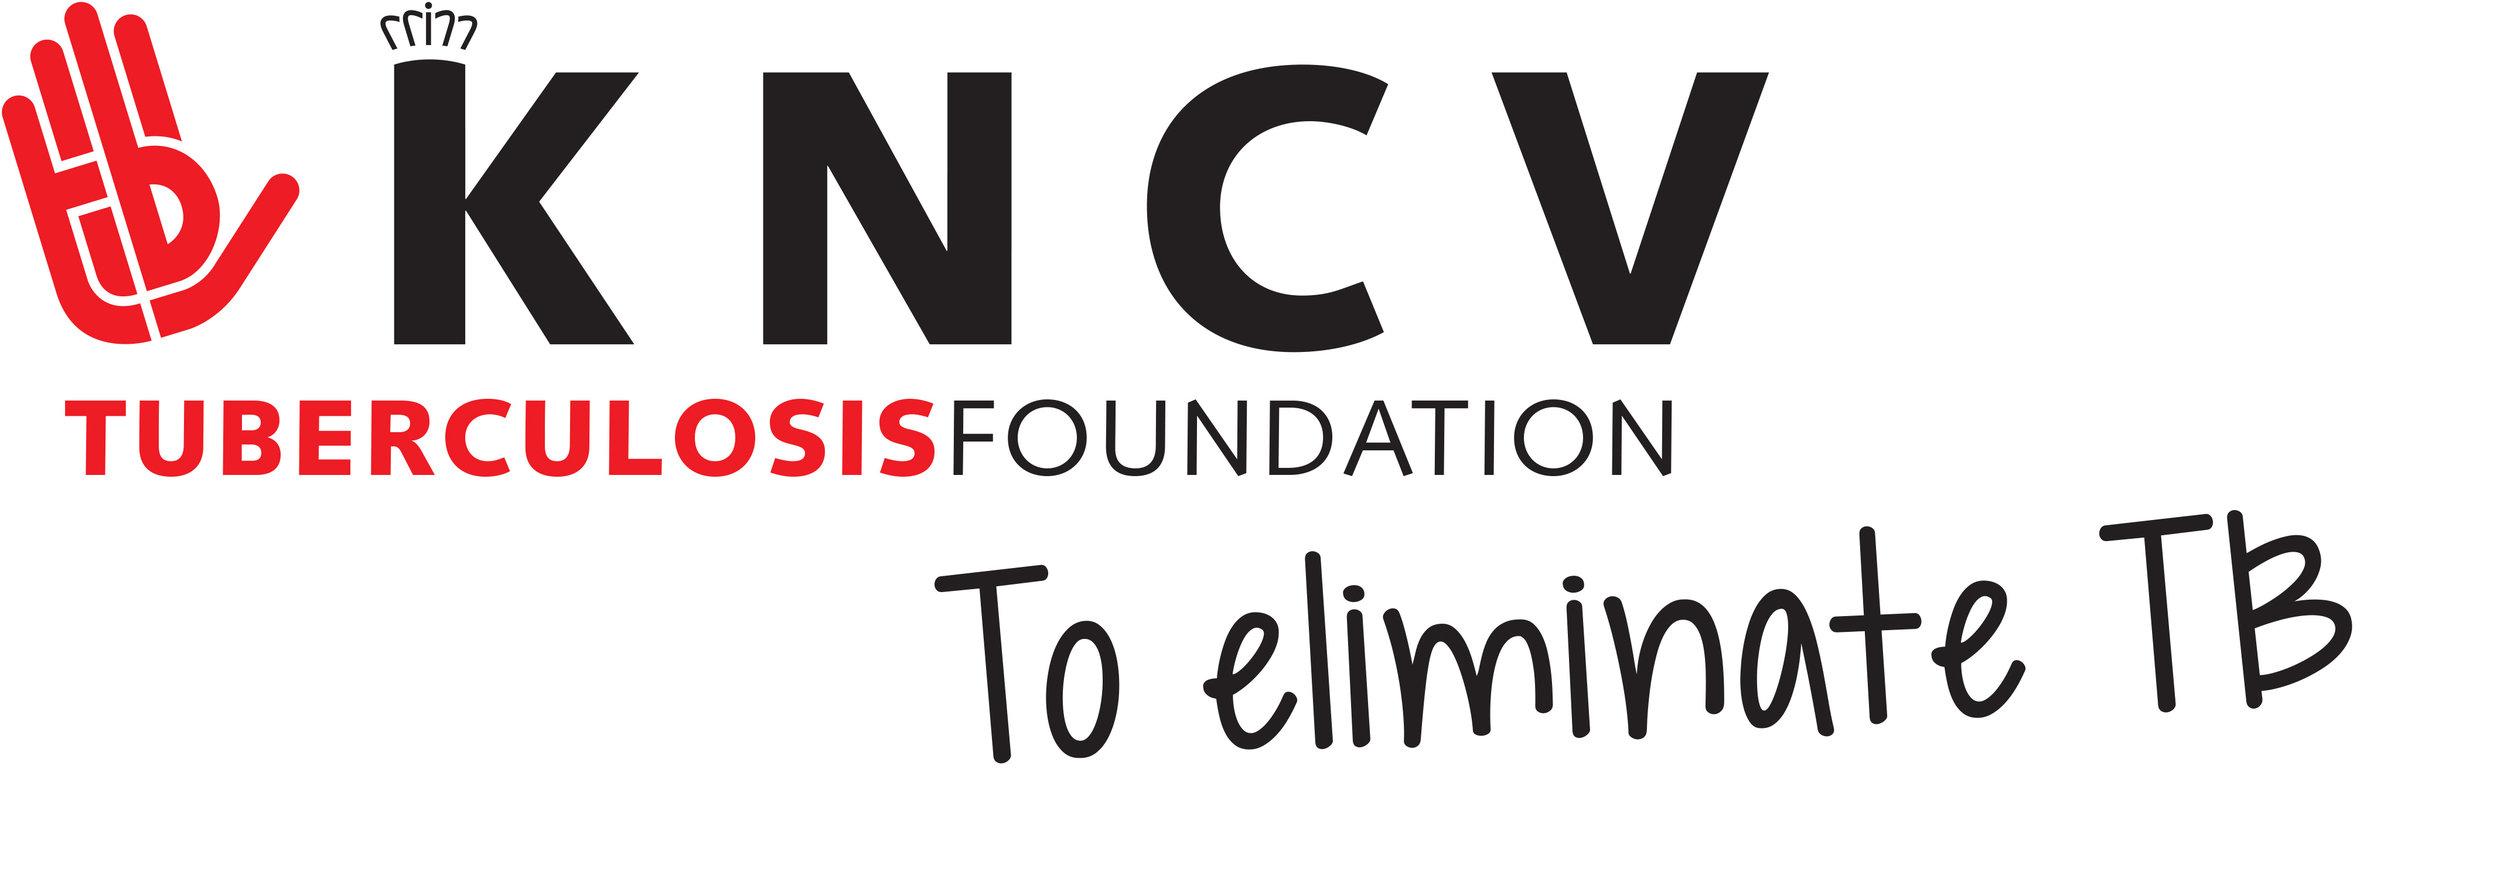 KNCV Tuberculosis Foundation